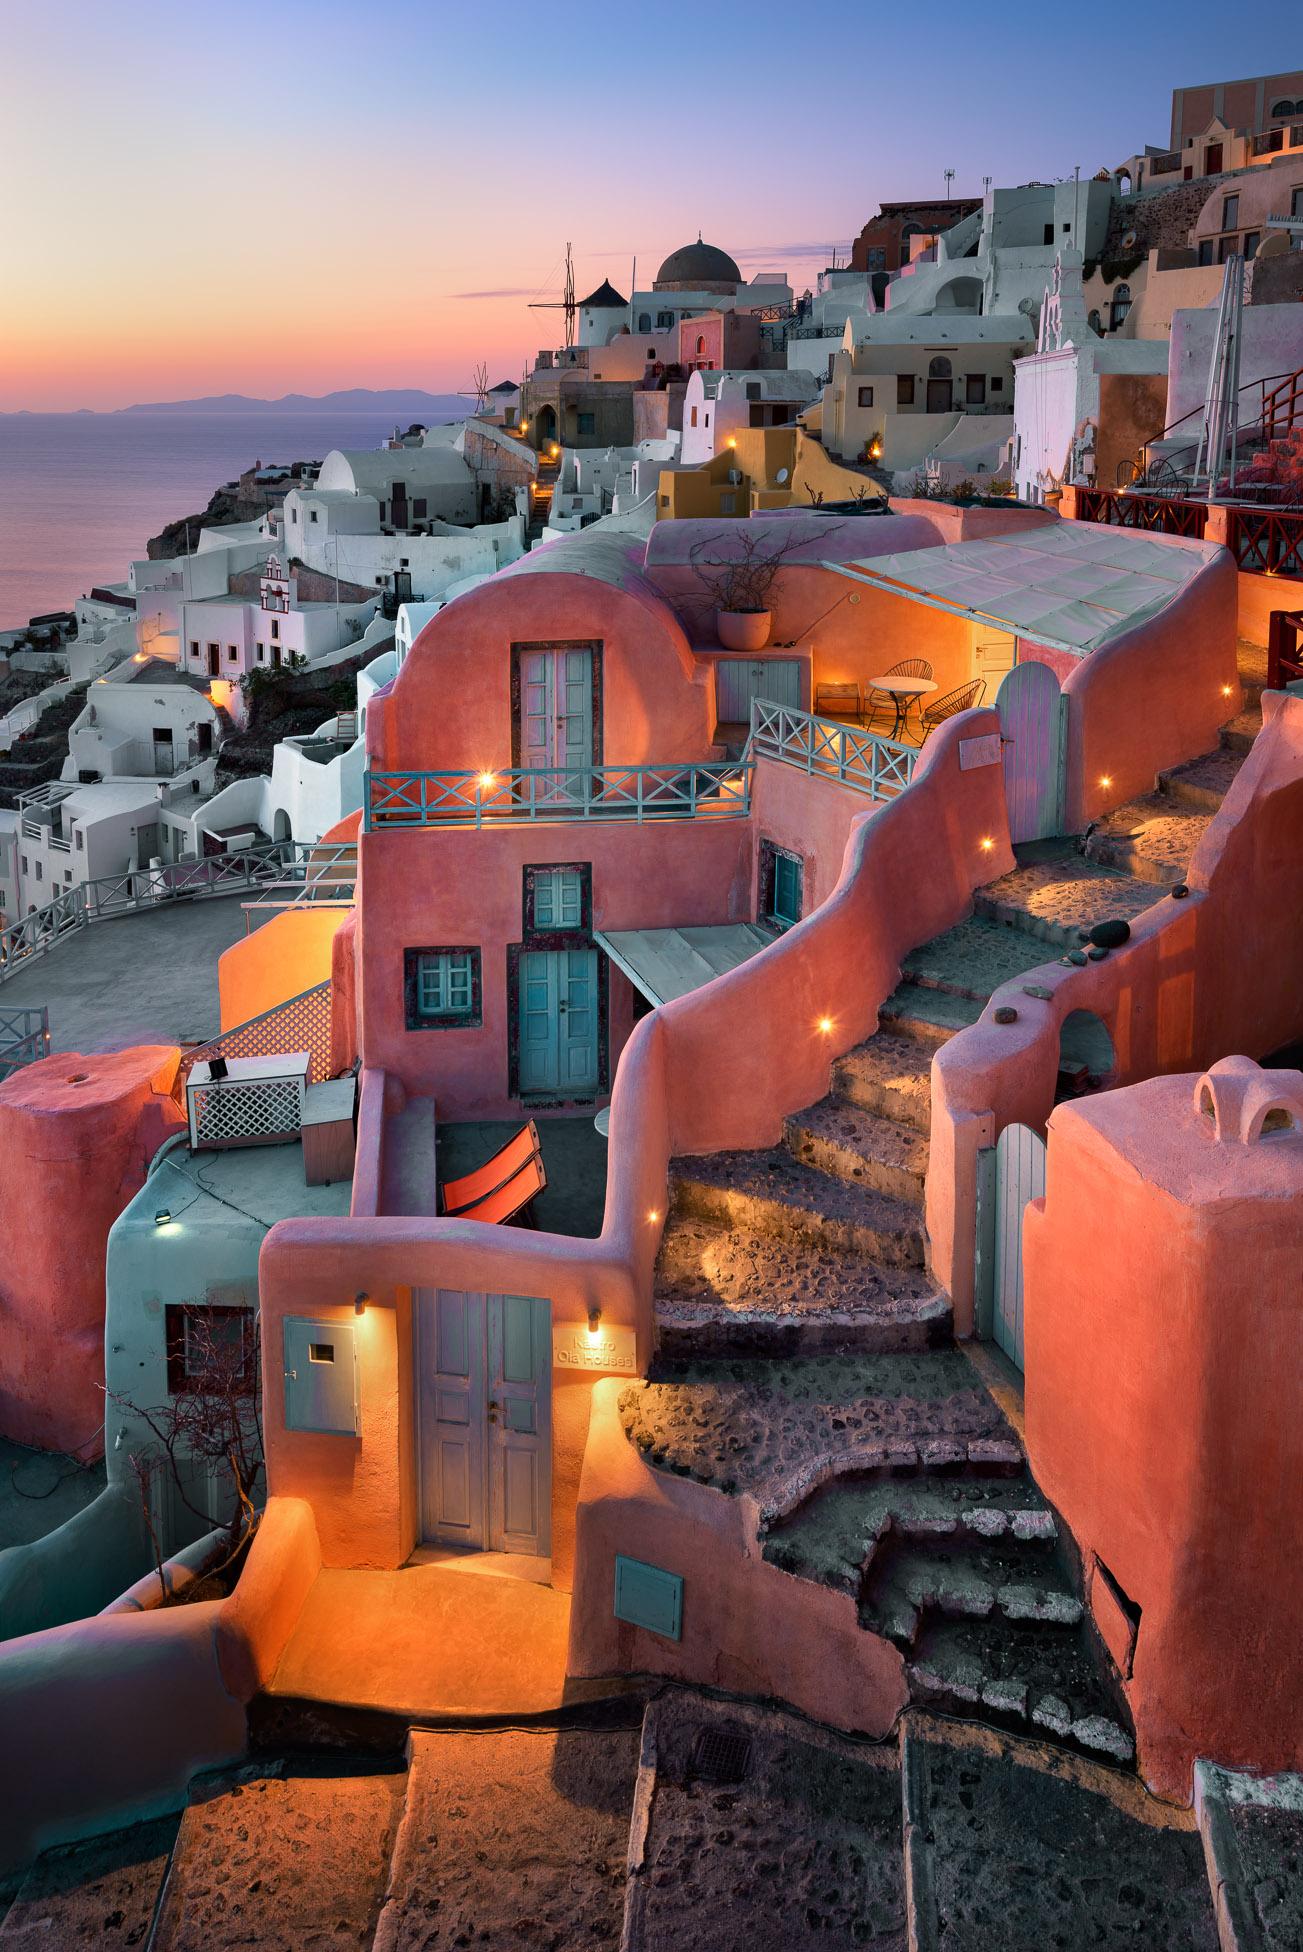 Oia Village in the Evening, Santorini, Greece